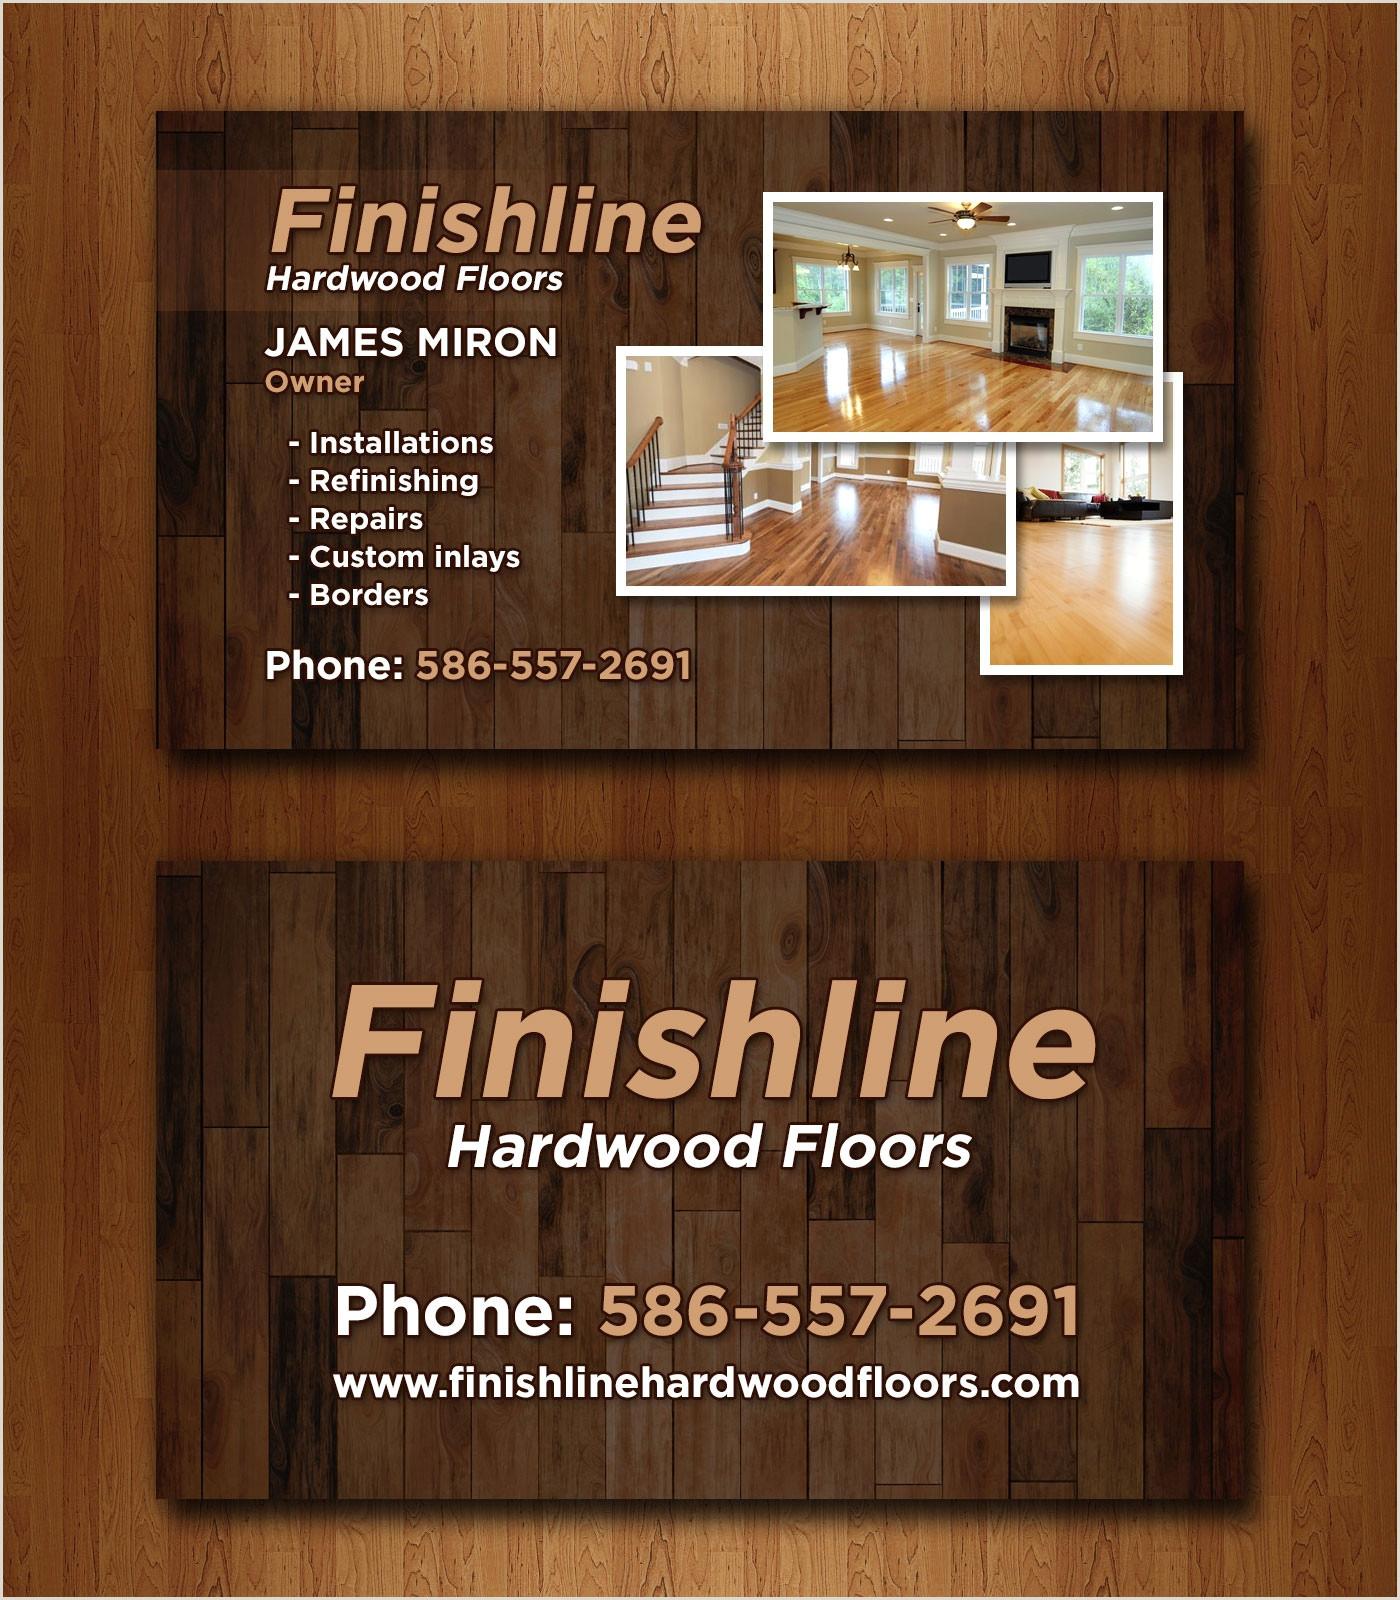 Modern Business Cards Ideas 14 Popular Hardwood Flooring Business Card Template